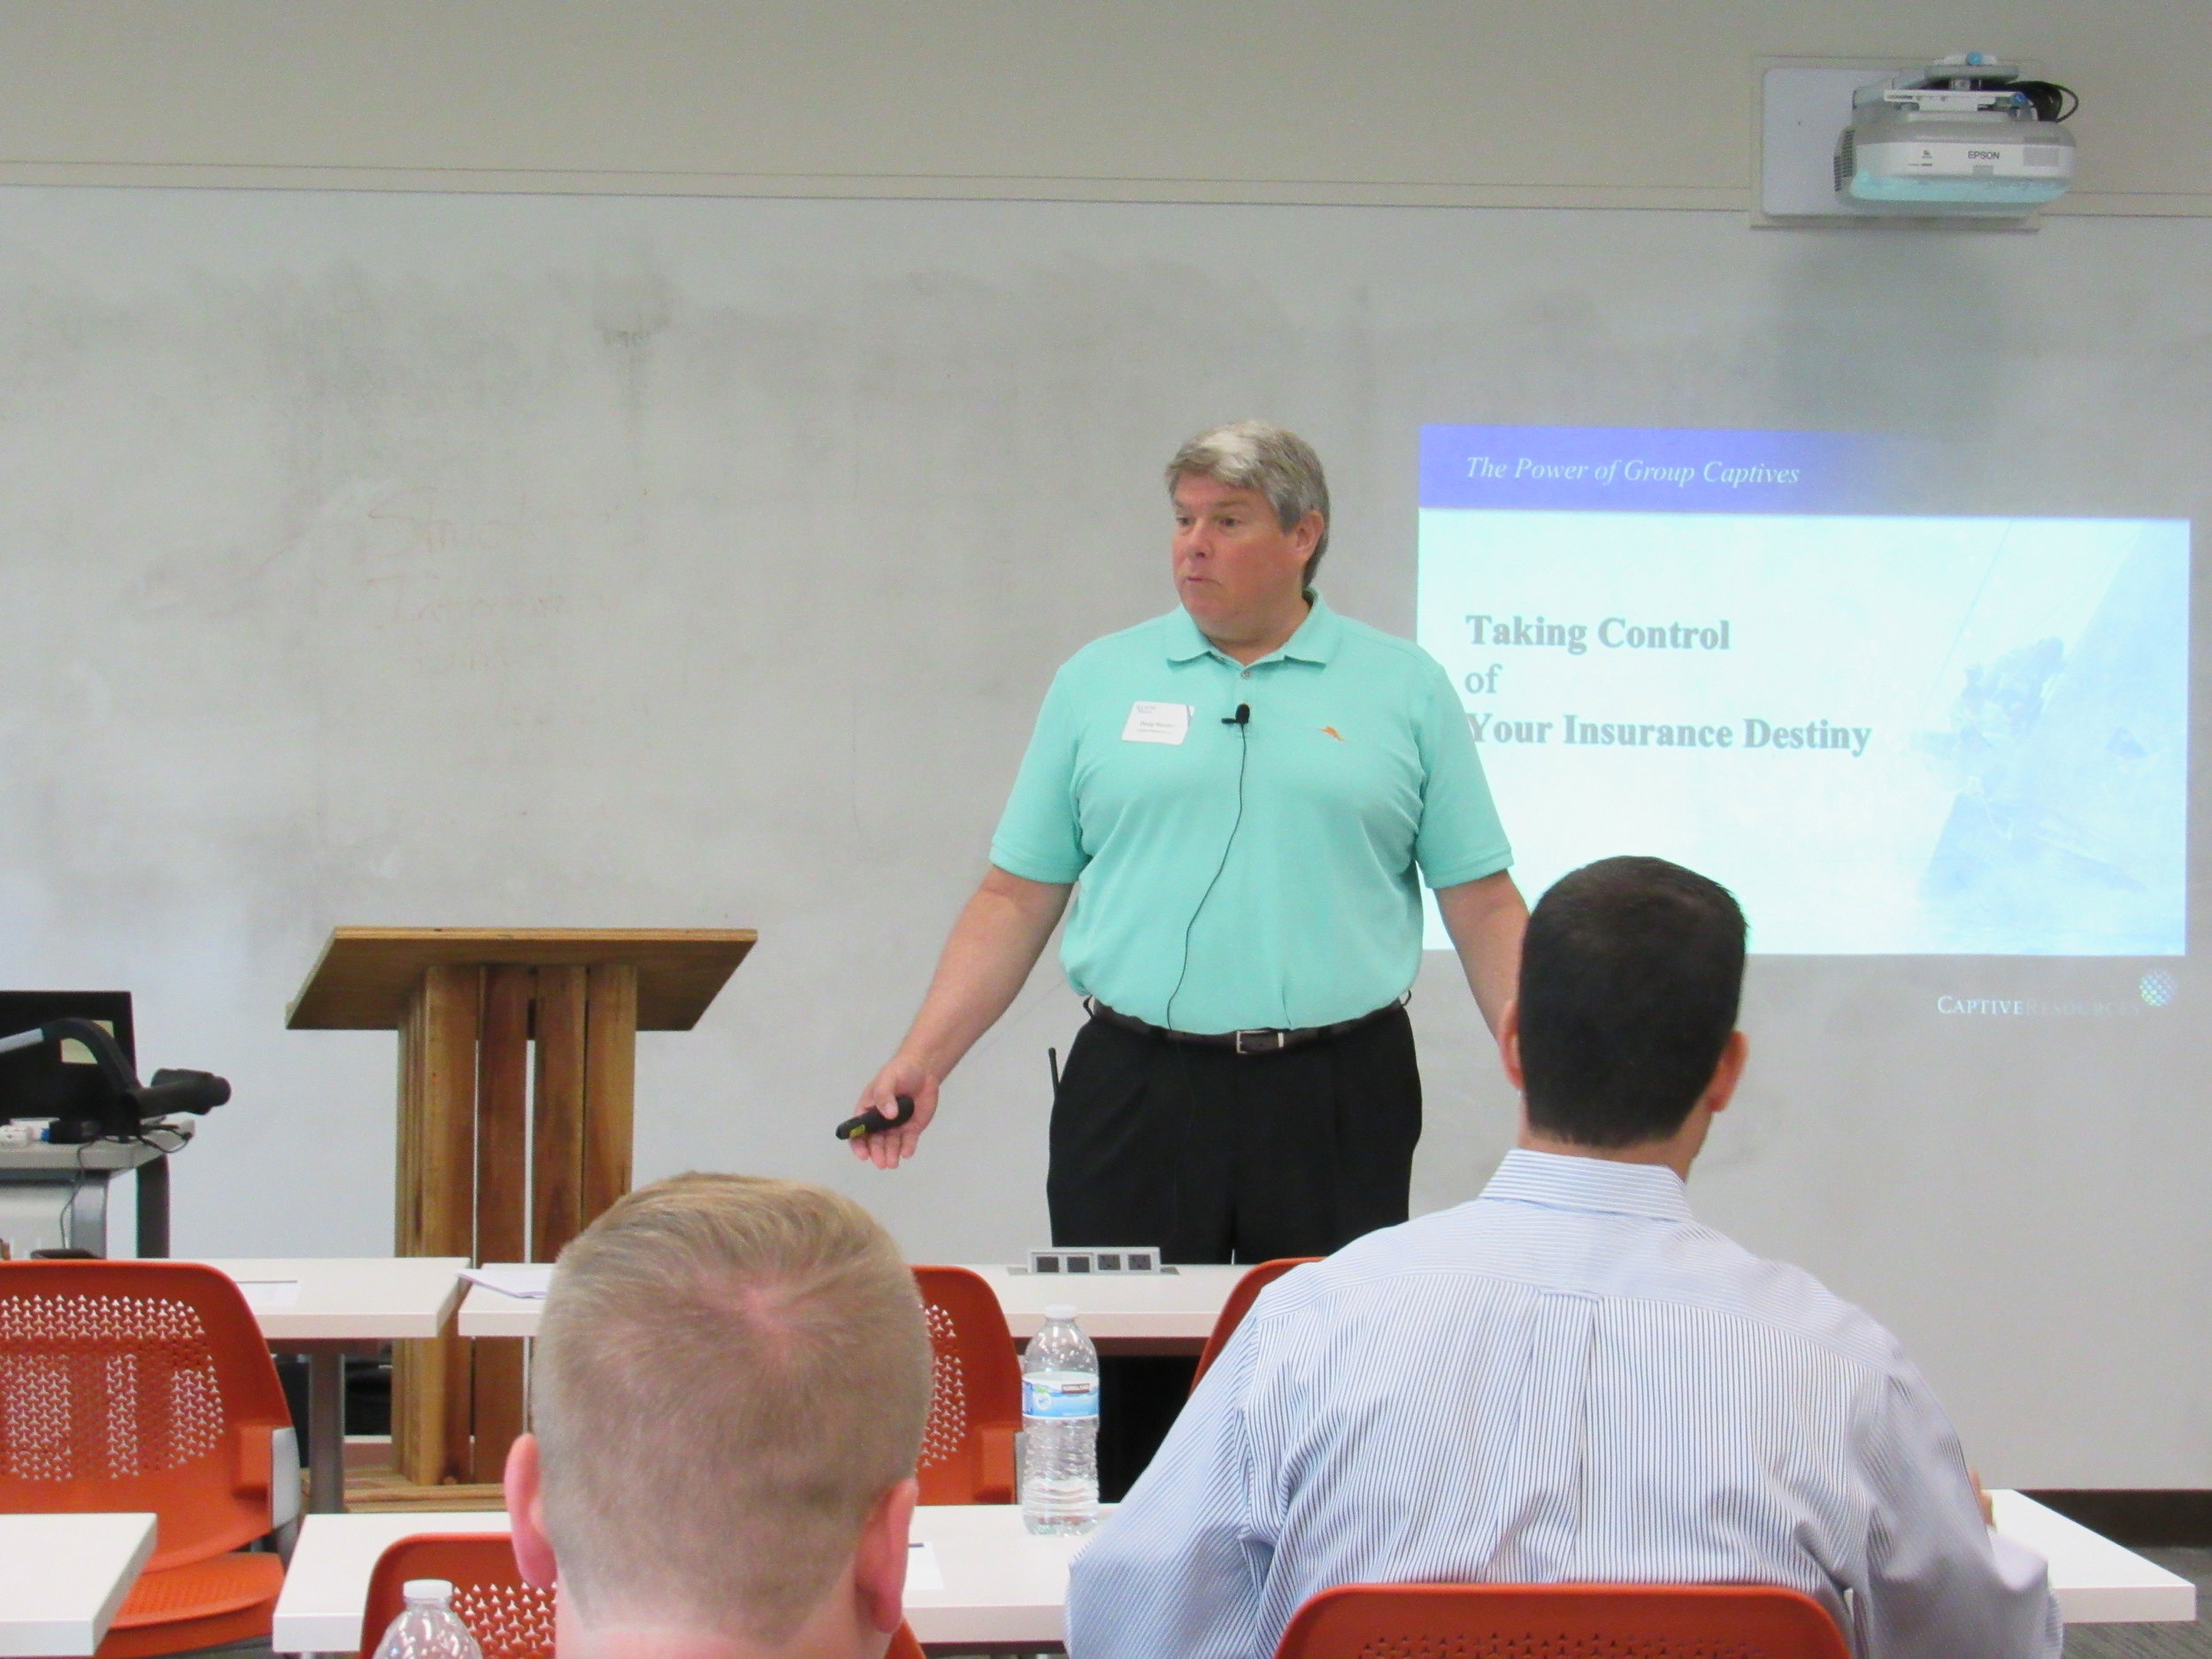 Doug Hayden speaking in front of a group of people.